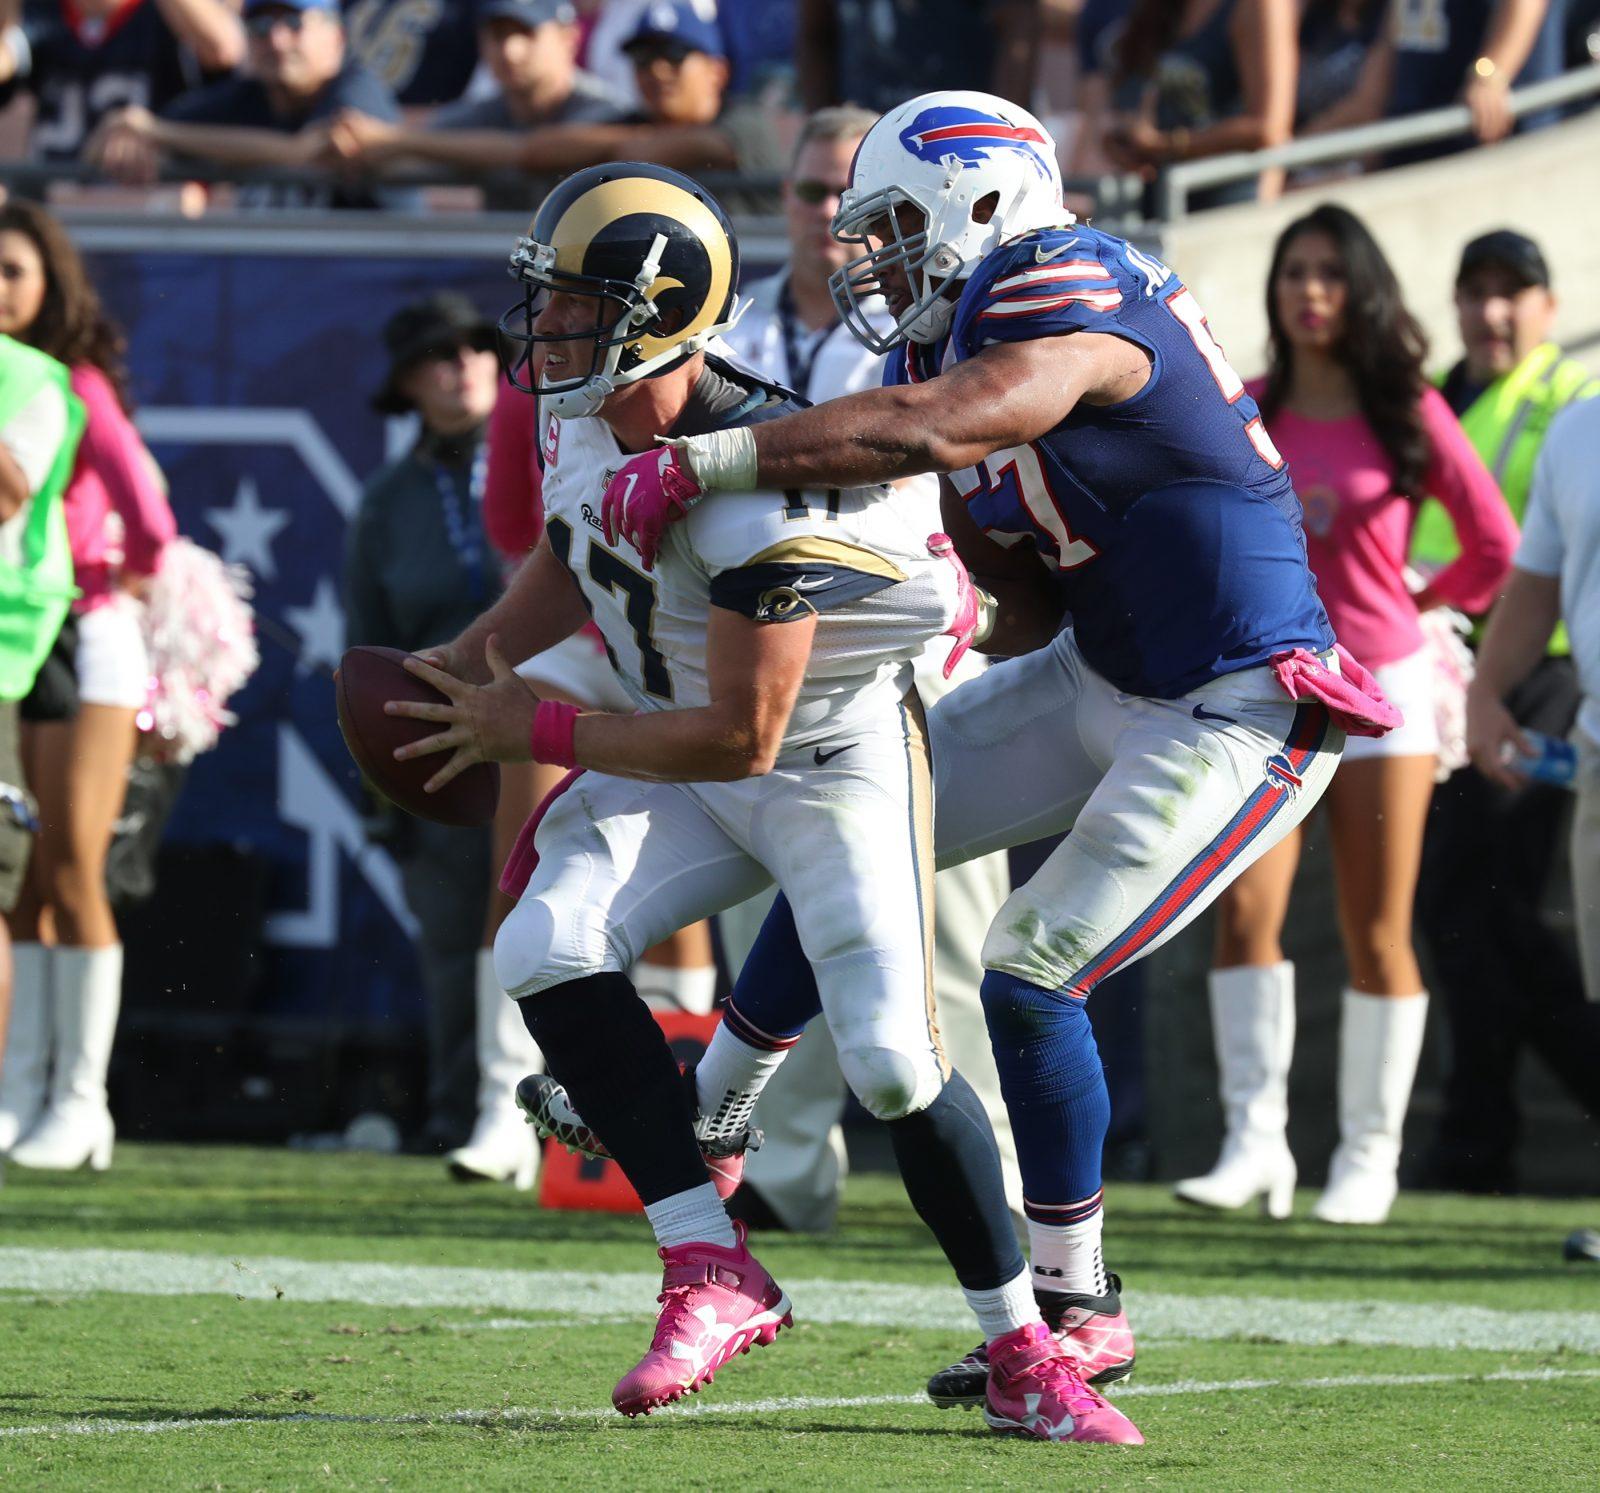 Buffalo Bills outside linebacker Lorenzo Alexander (57) sacks Los Angeles Rams quarterback Case Keenum (17)  and forces an interception at Los Angeles Memorial Colliseum. (James P. McCoy/ Buffalo News)